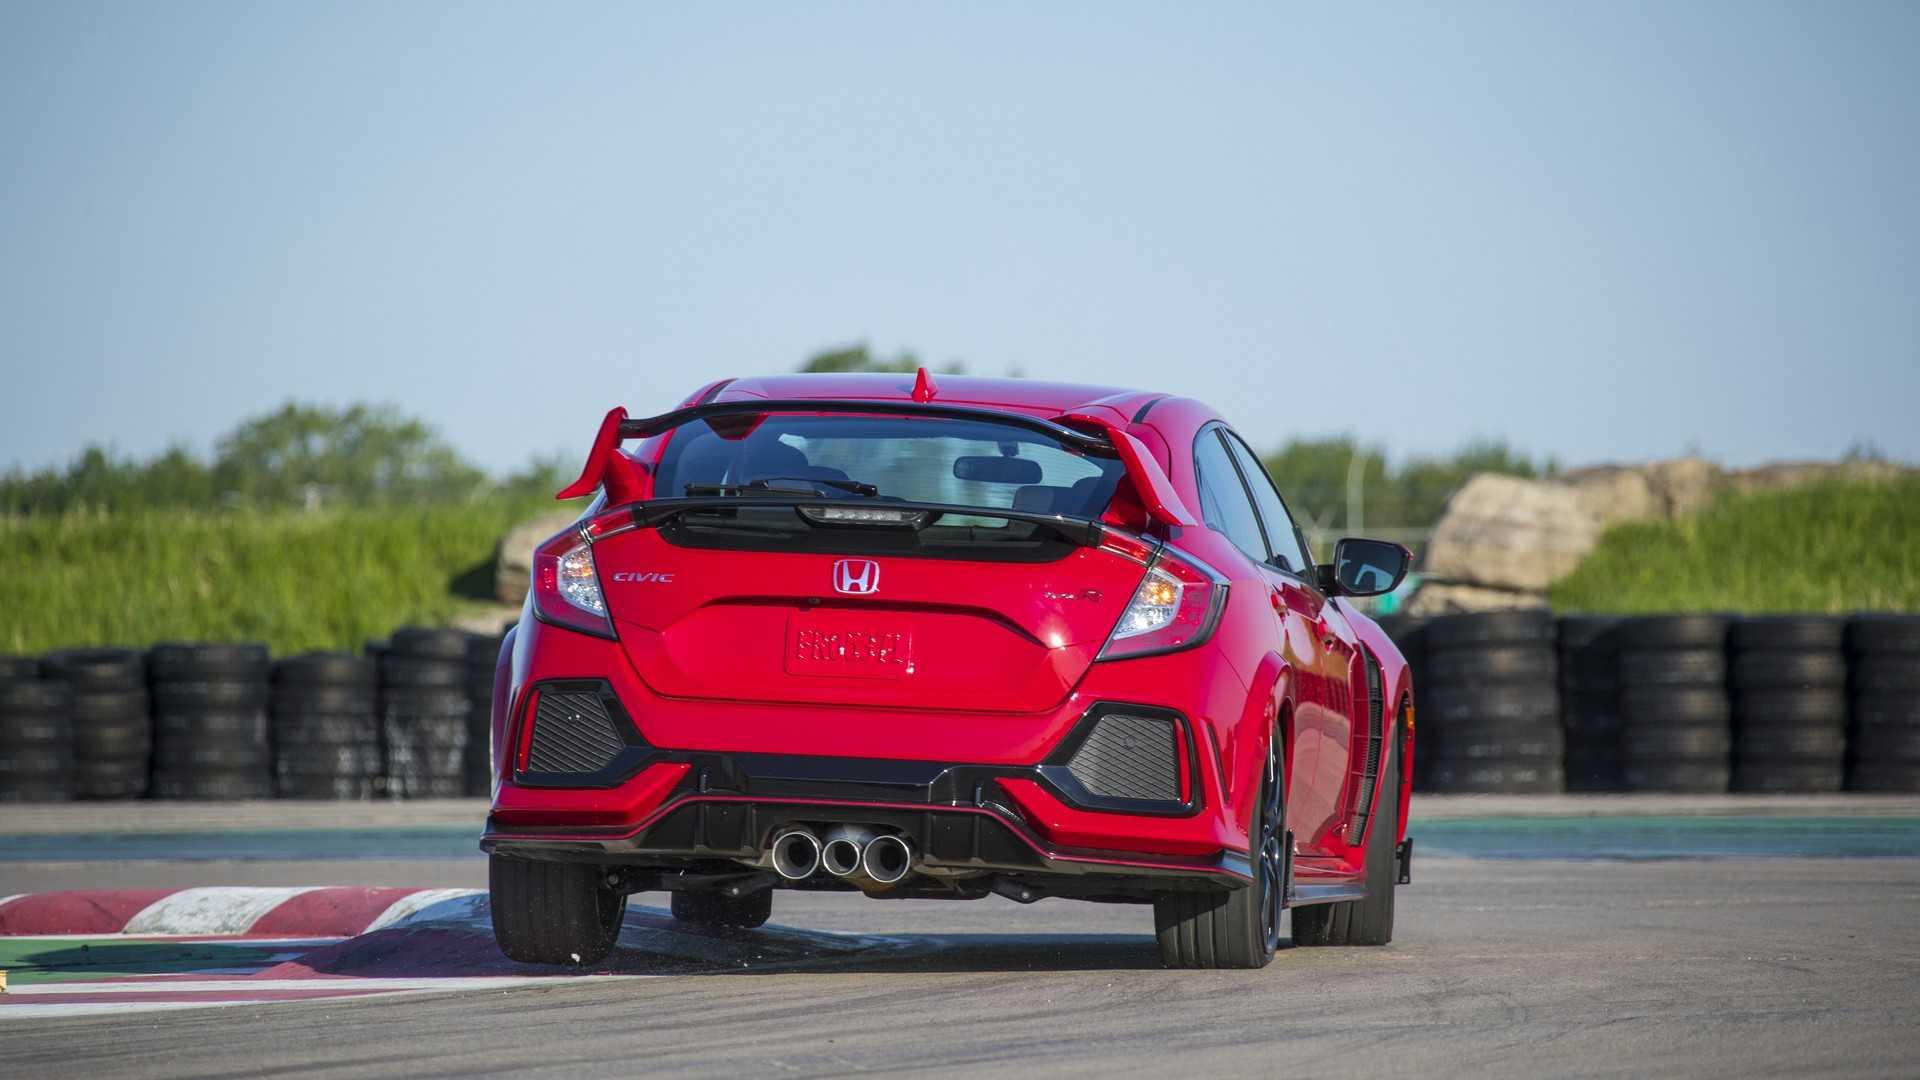 2019 Honda Civic Type R (Color: Rallye Red) Rear Wallpaper (13)